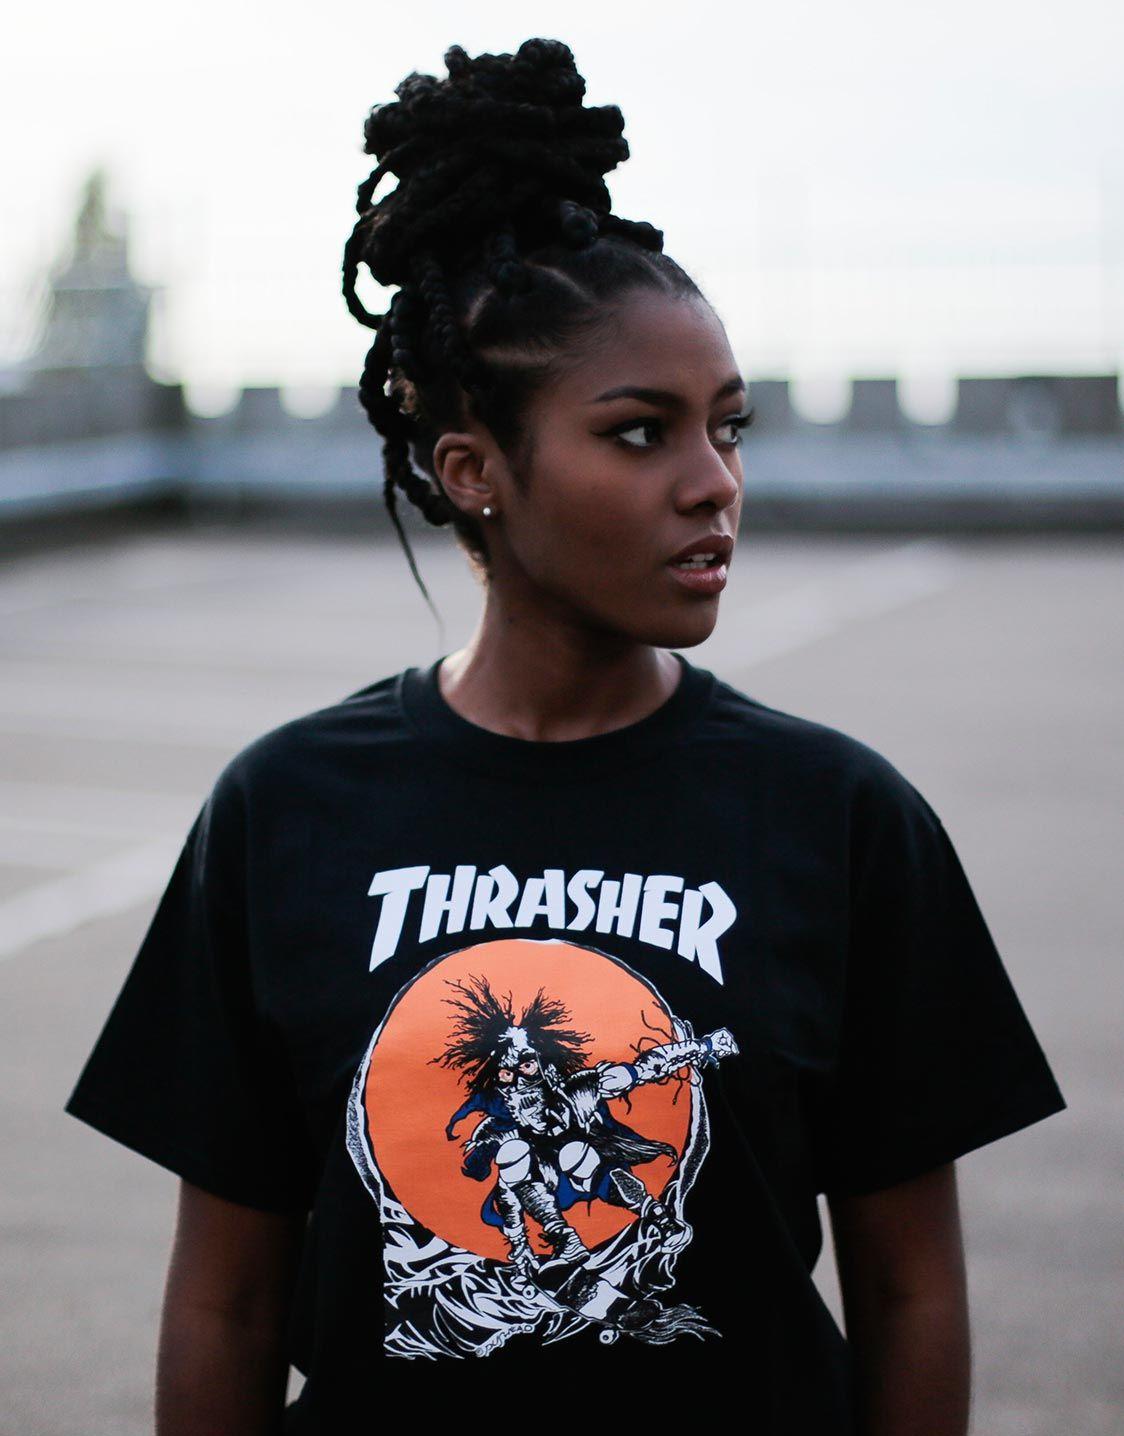 64c767ae1102 Thrasher Magazine Skate outlaw t-shirt | TRASHER magazine | Magazine ...